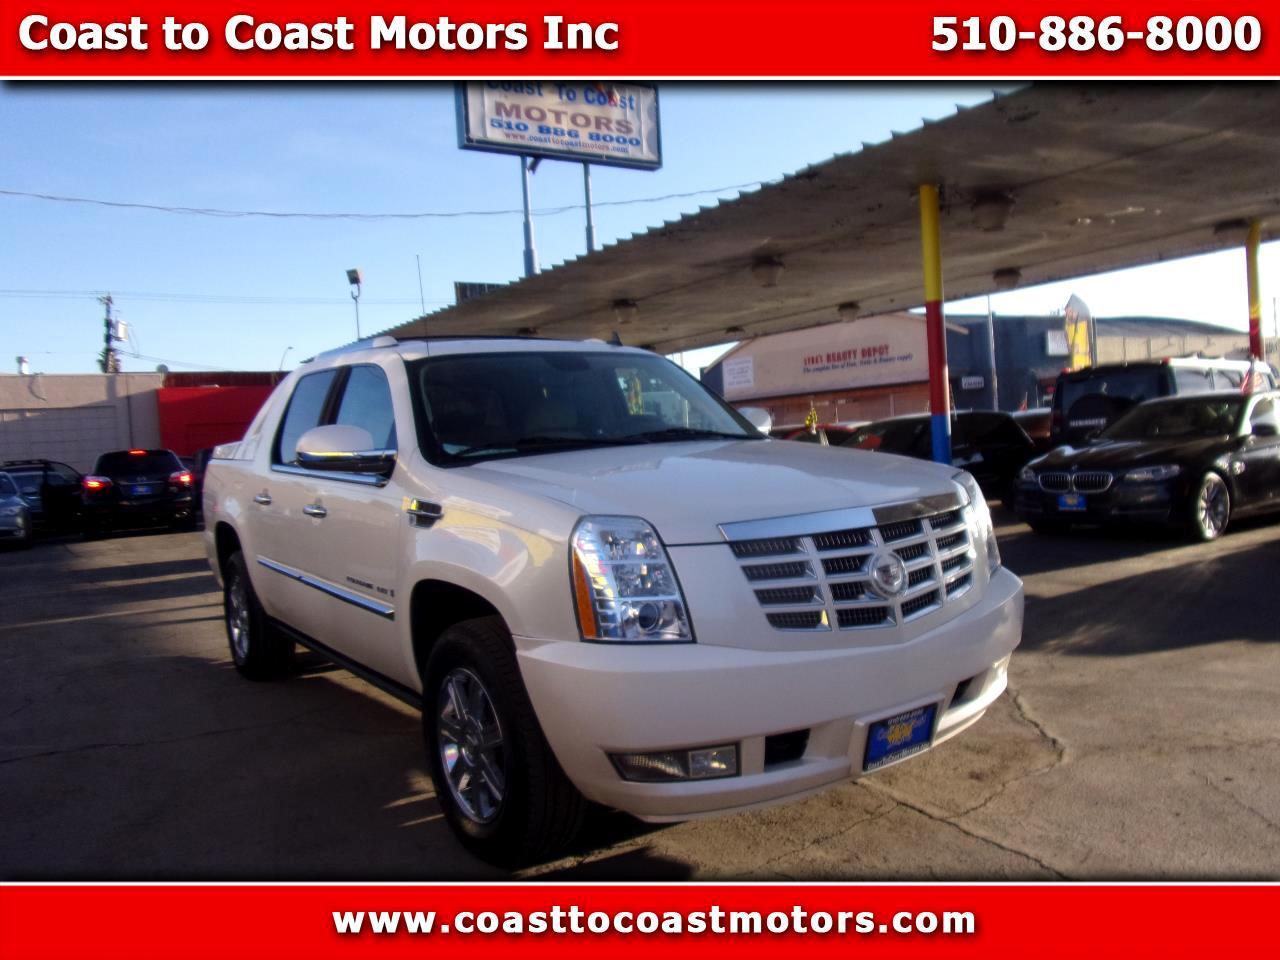 Cadillac Escalade EXT Sport Utility Truck 2008